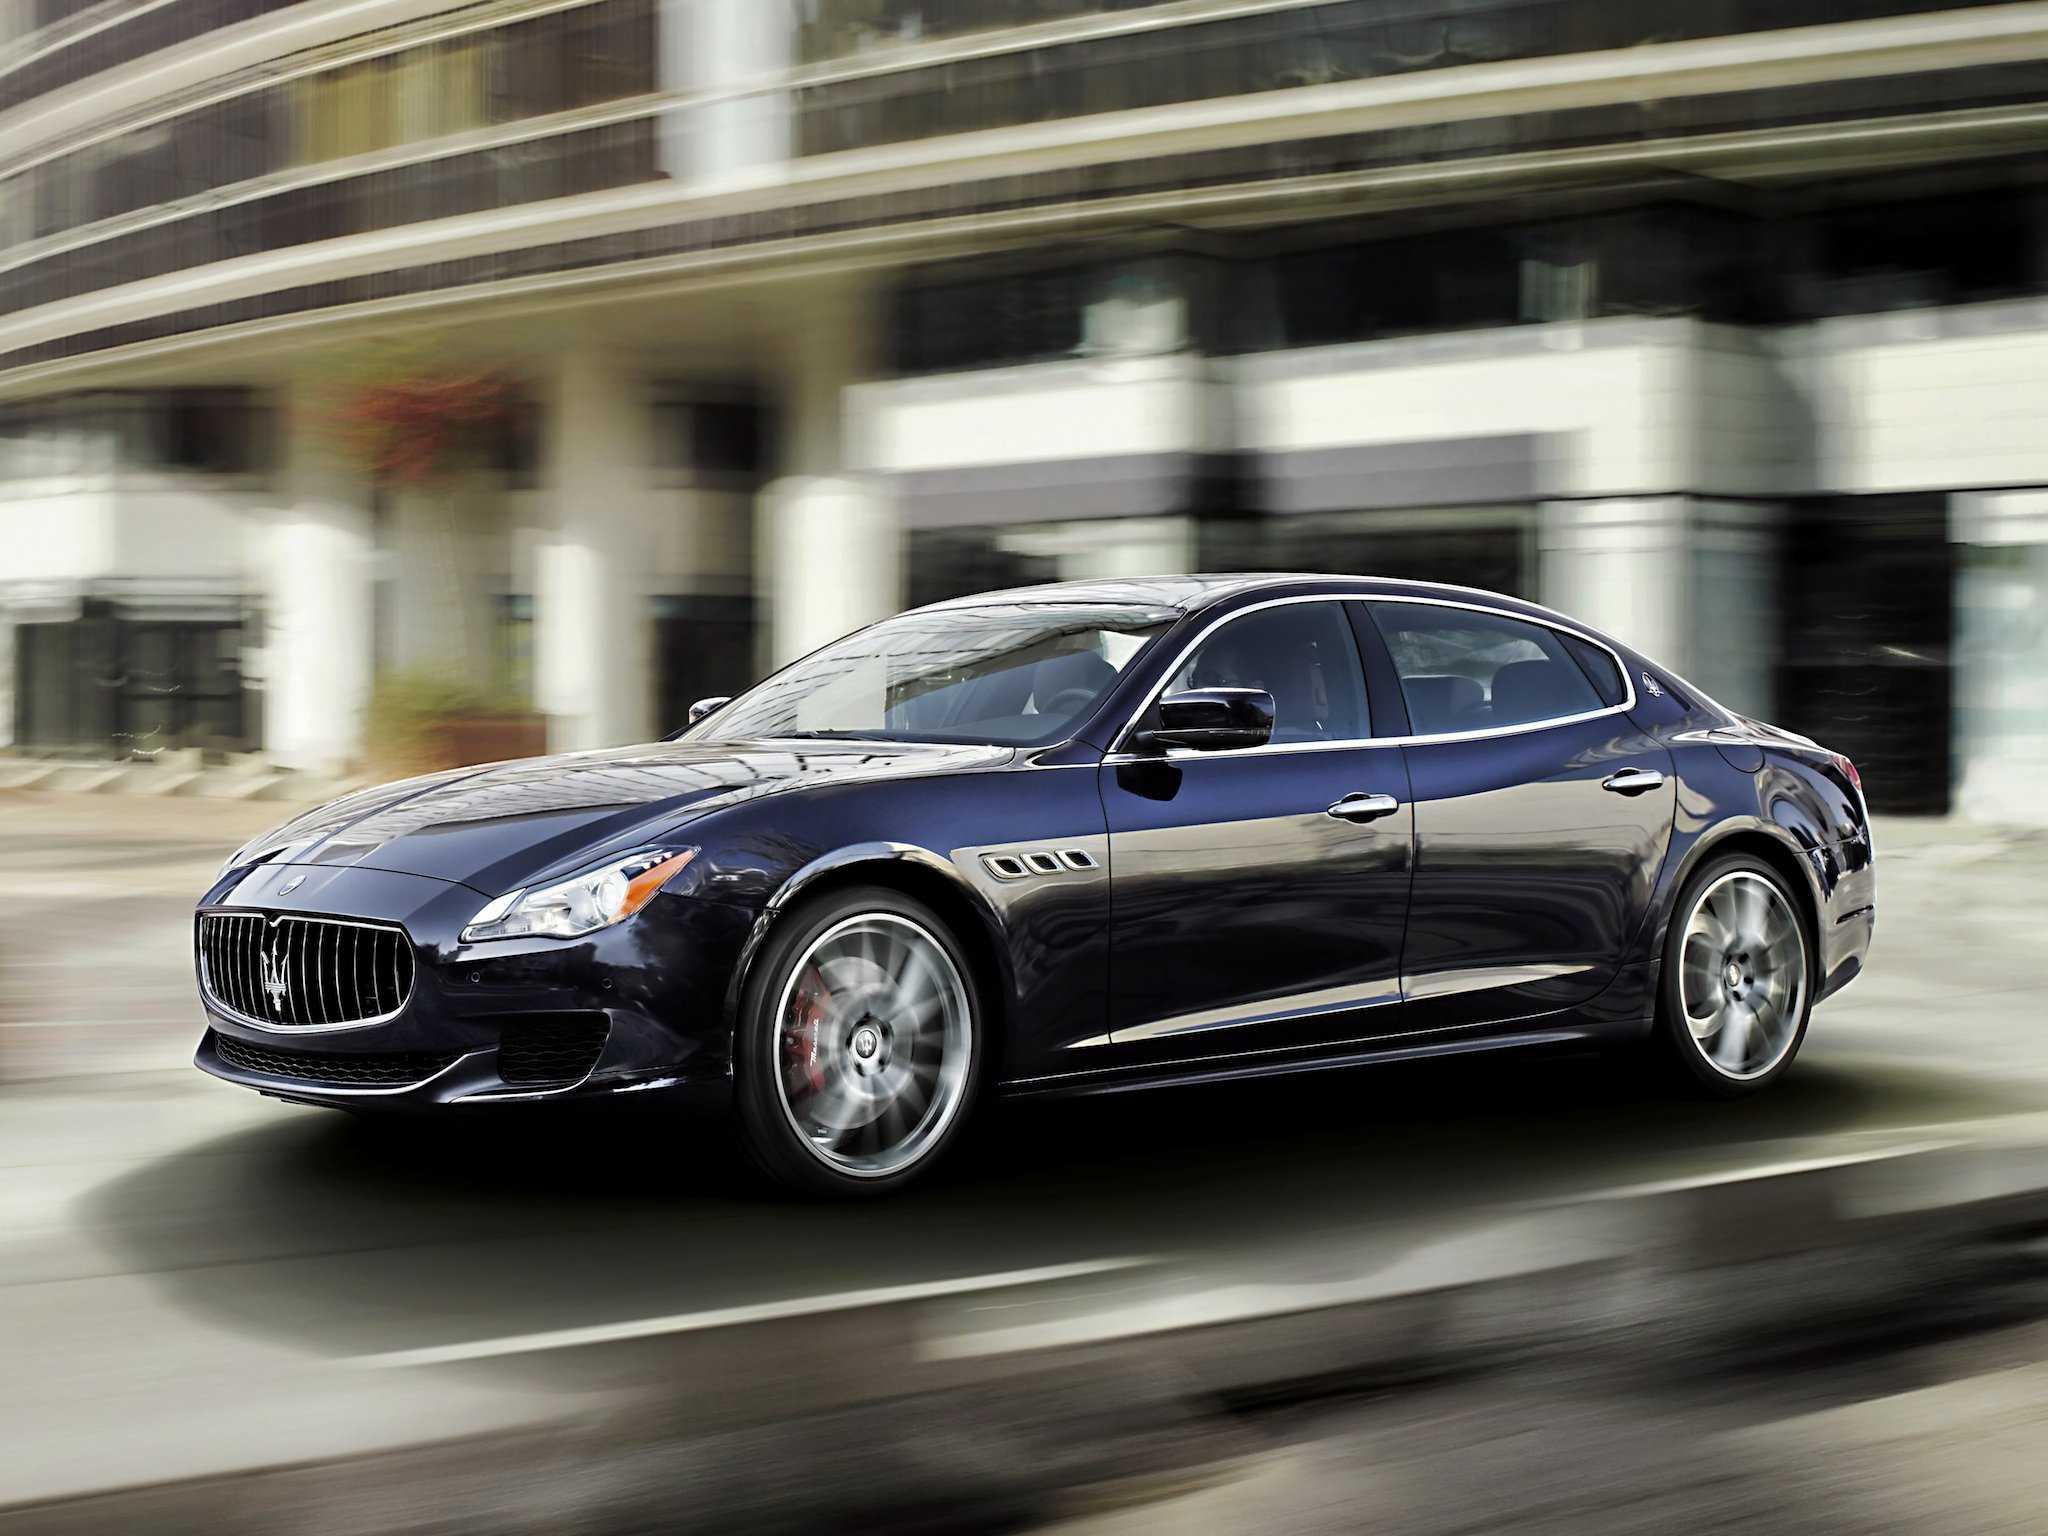 Maserati quattroporte - обзор, цены, видео, технические характеристики мазерати кватропорте